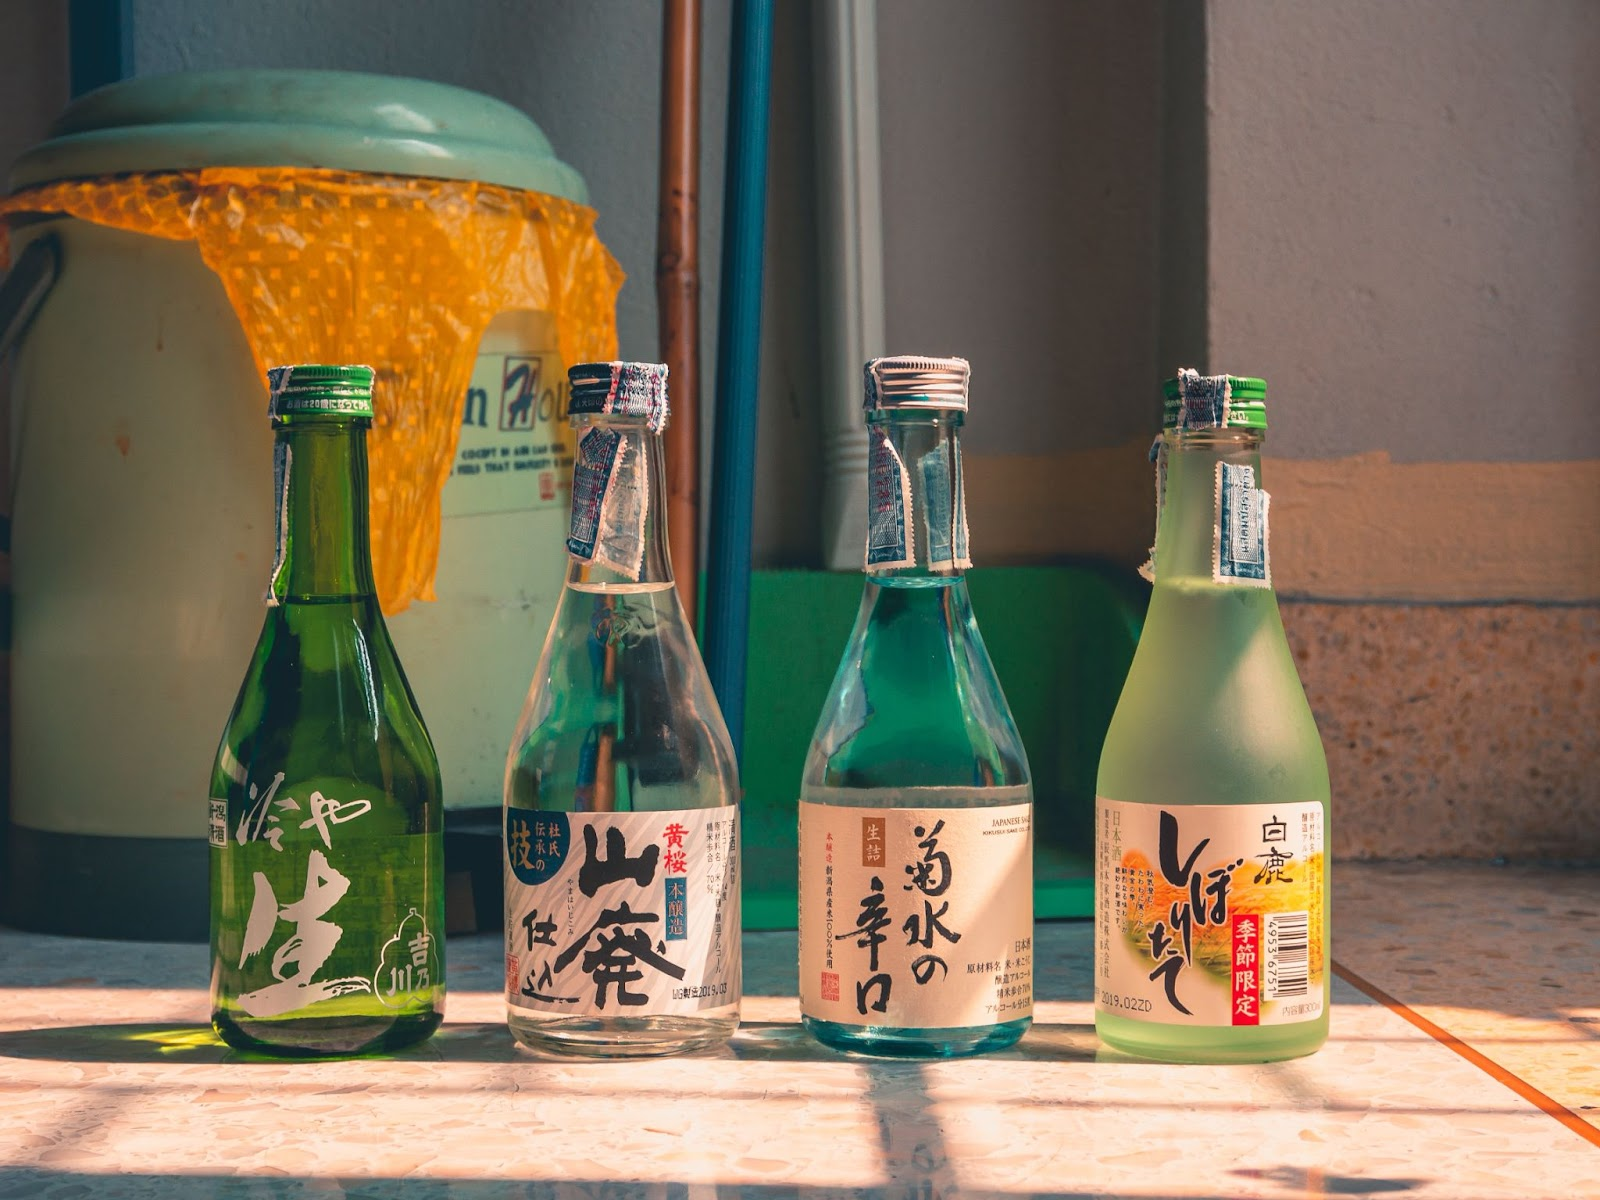 Photo by Zaji Kanamajina on Unsplash